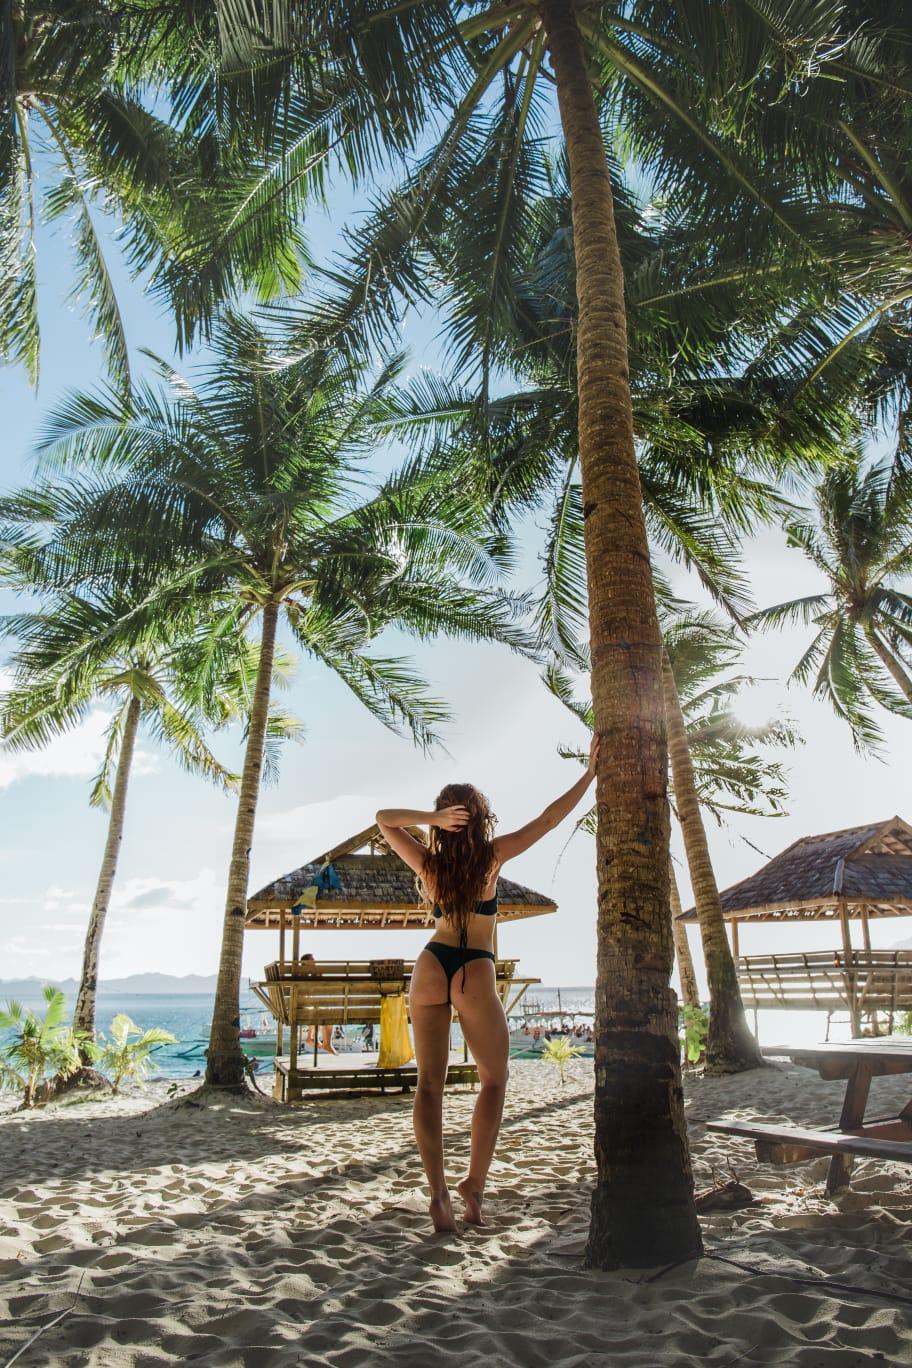 Philippines_redhead_round_the_world_travel_blogger_8.JPG